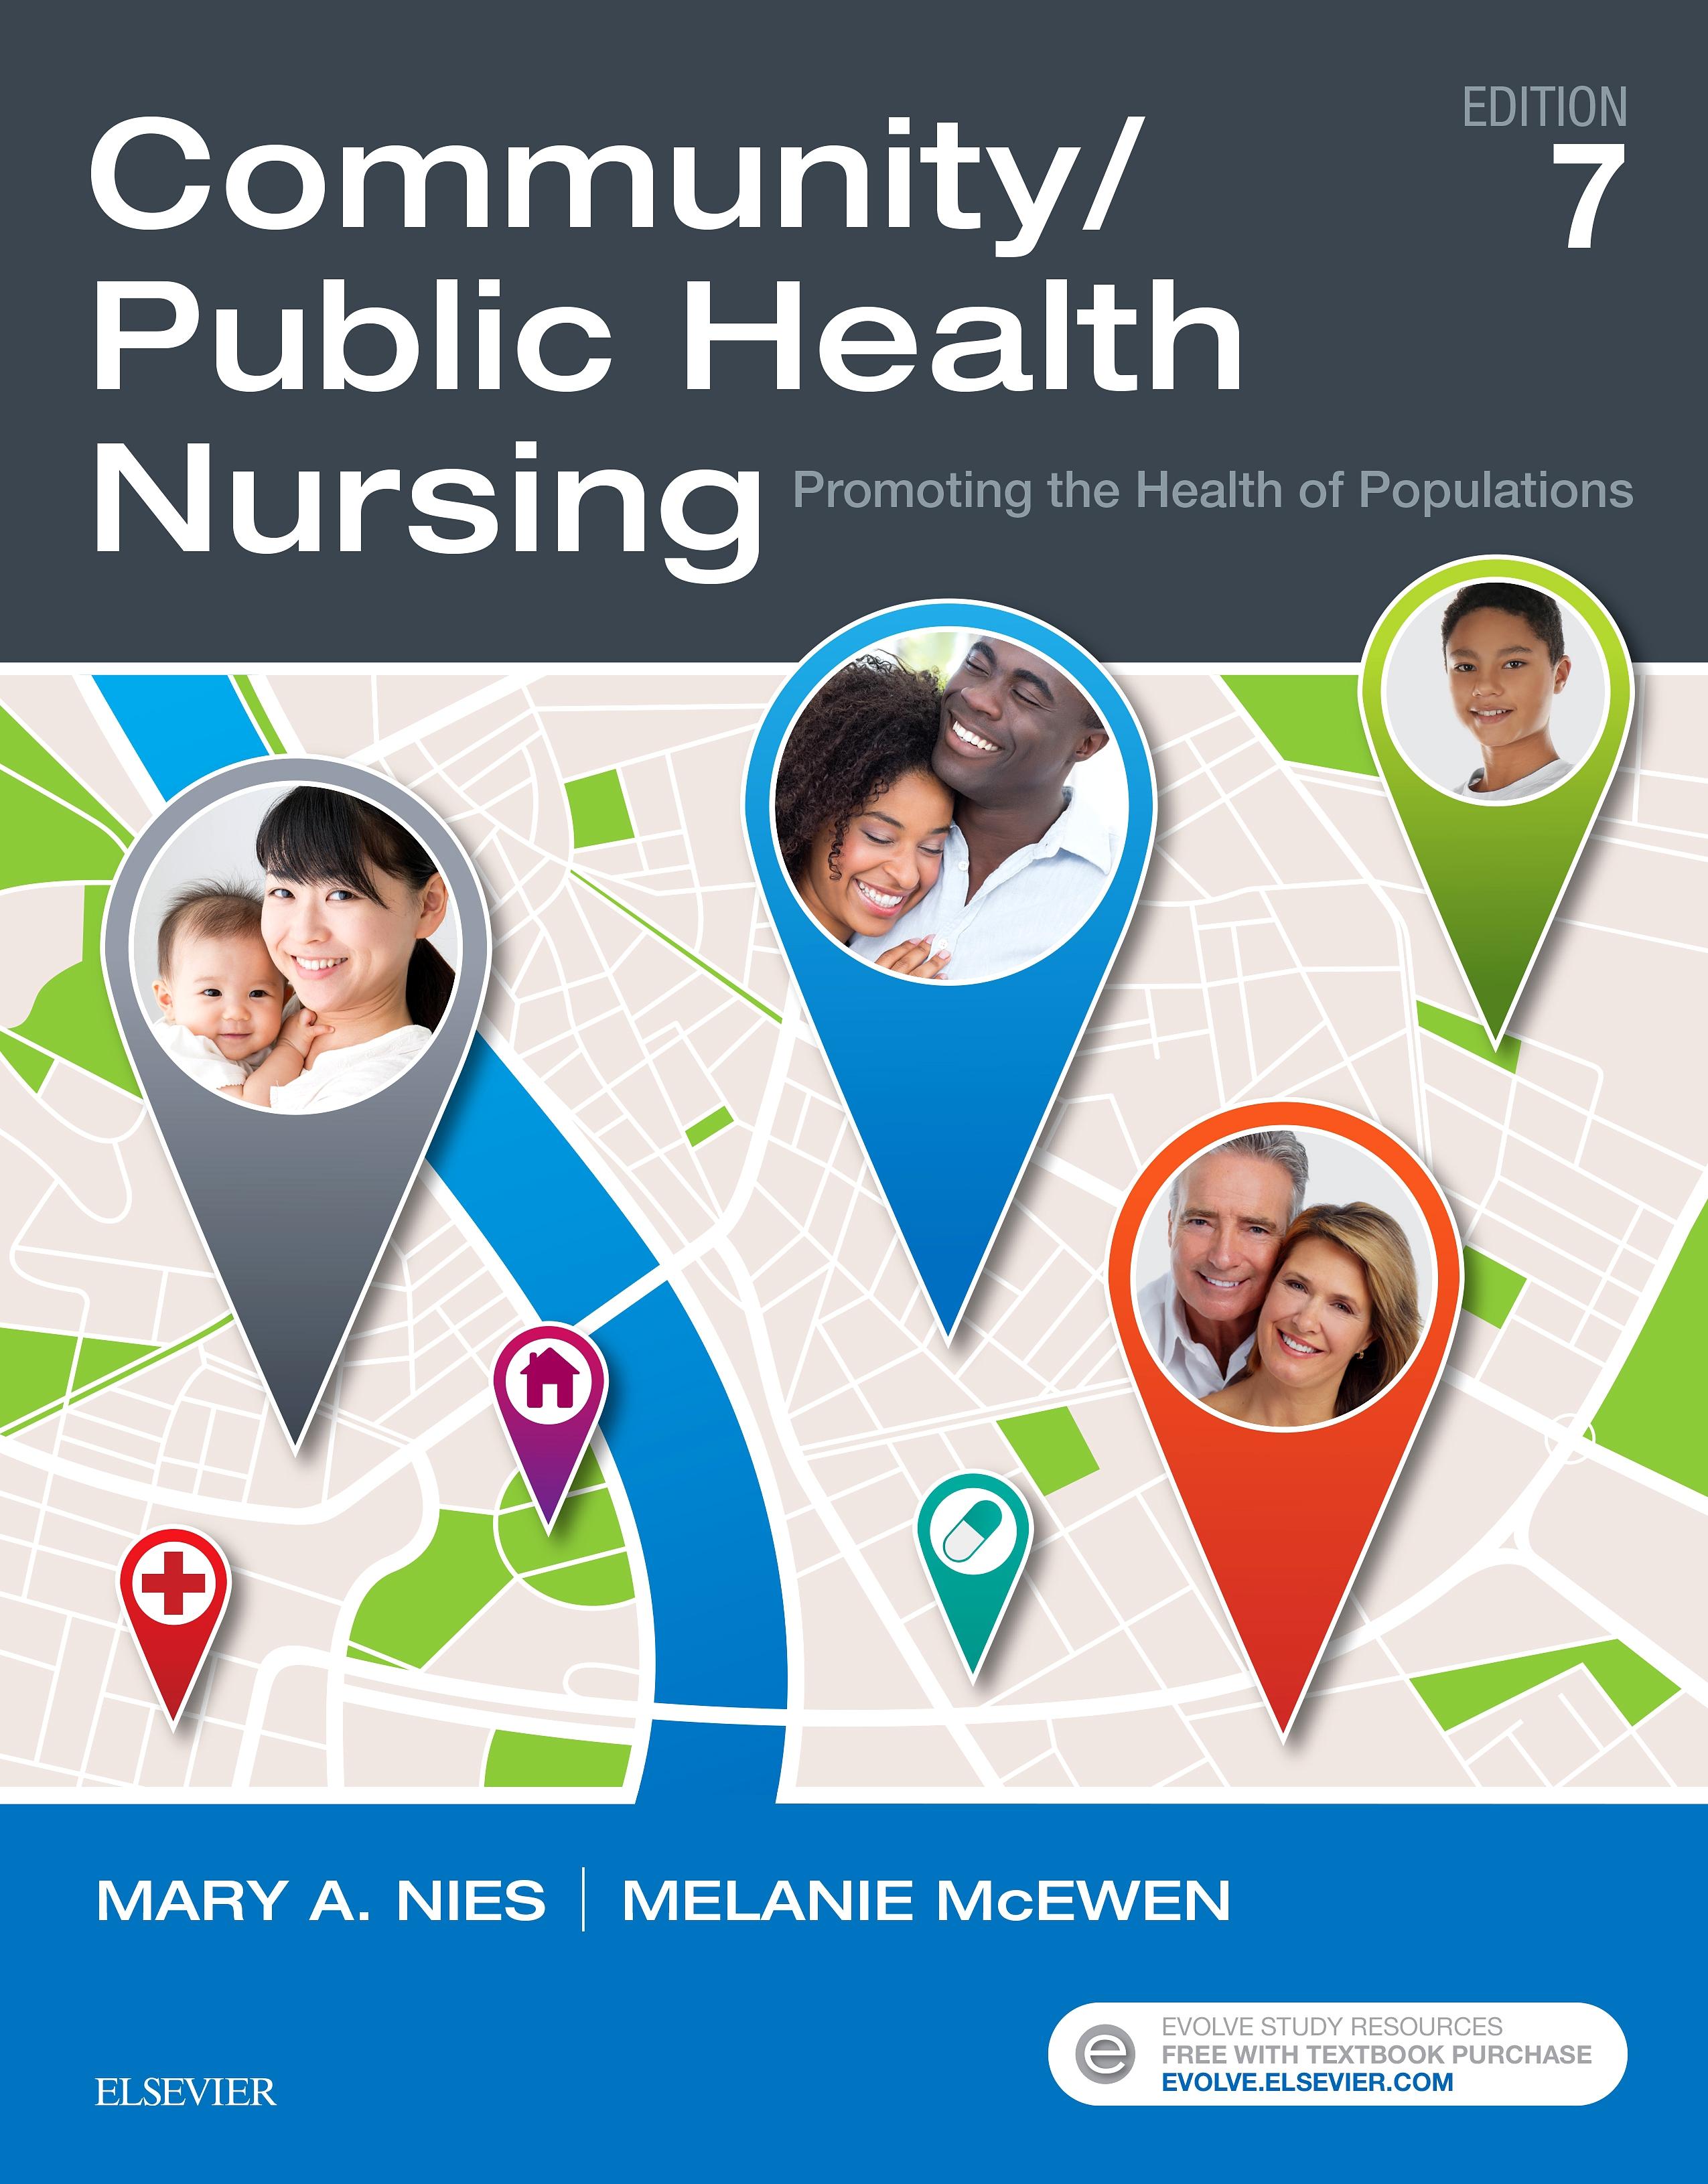 Evolve Resources for Community/Public Health Nursing, 7th Edition